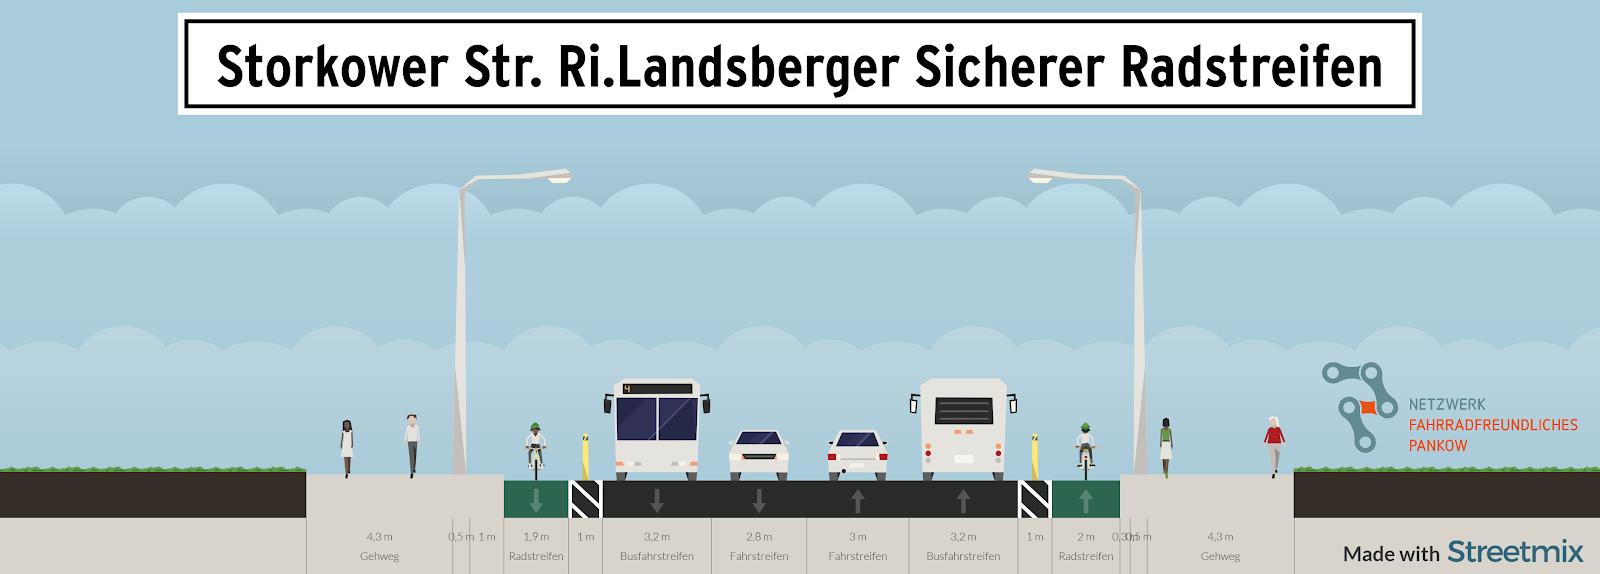 Variante 2: Storkower Straße Sicherer Radstreifen (Protected Bike Lane, PBL)